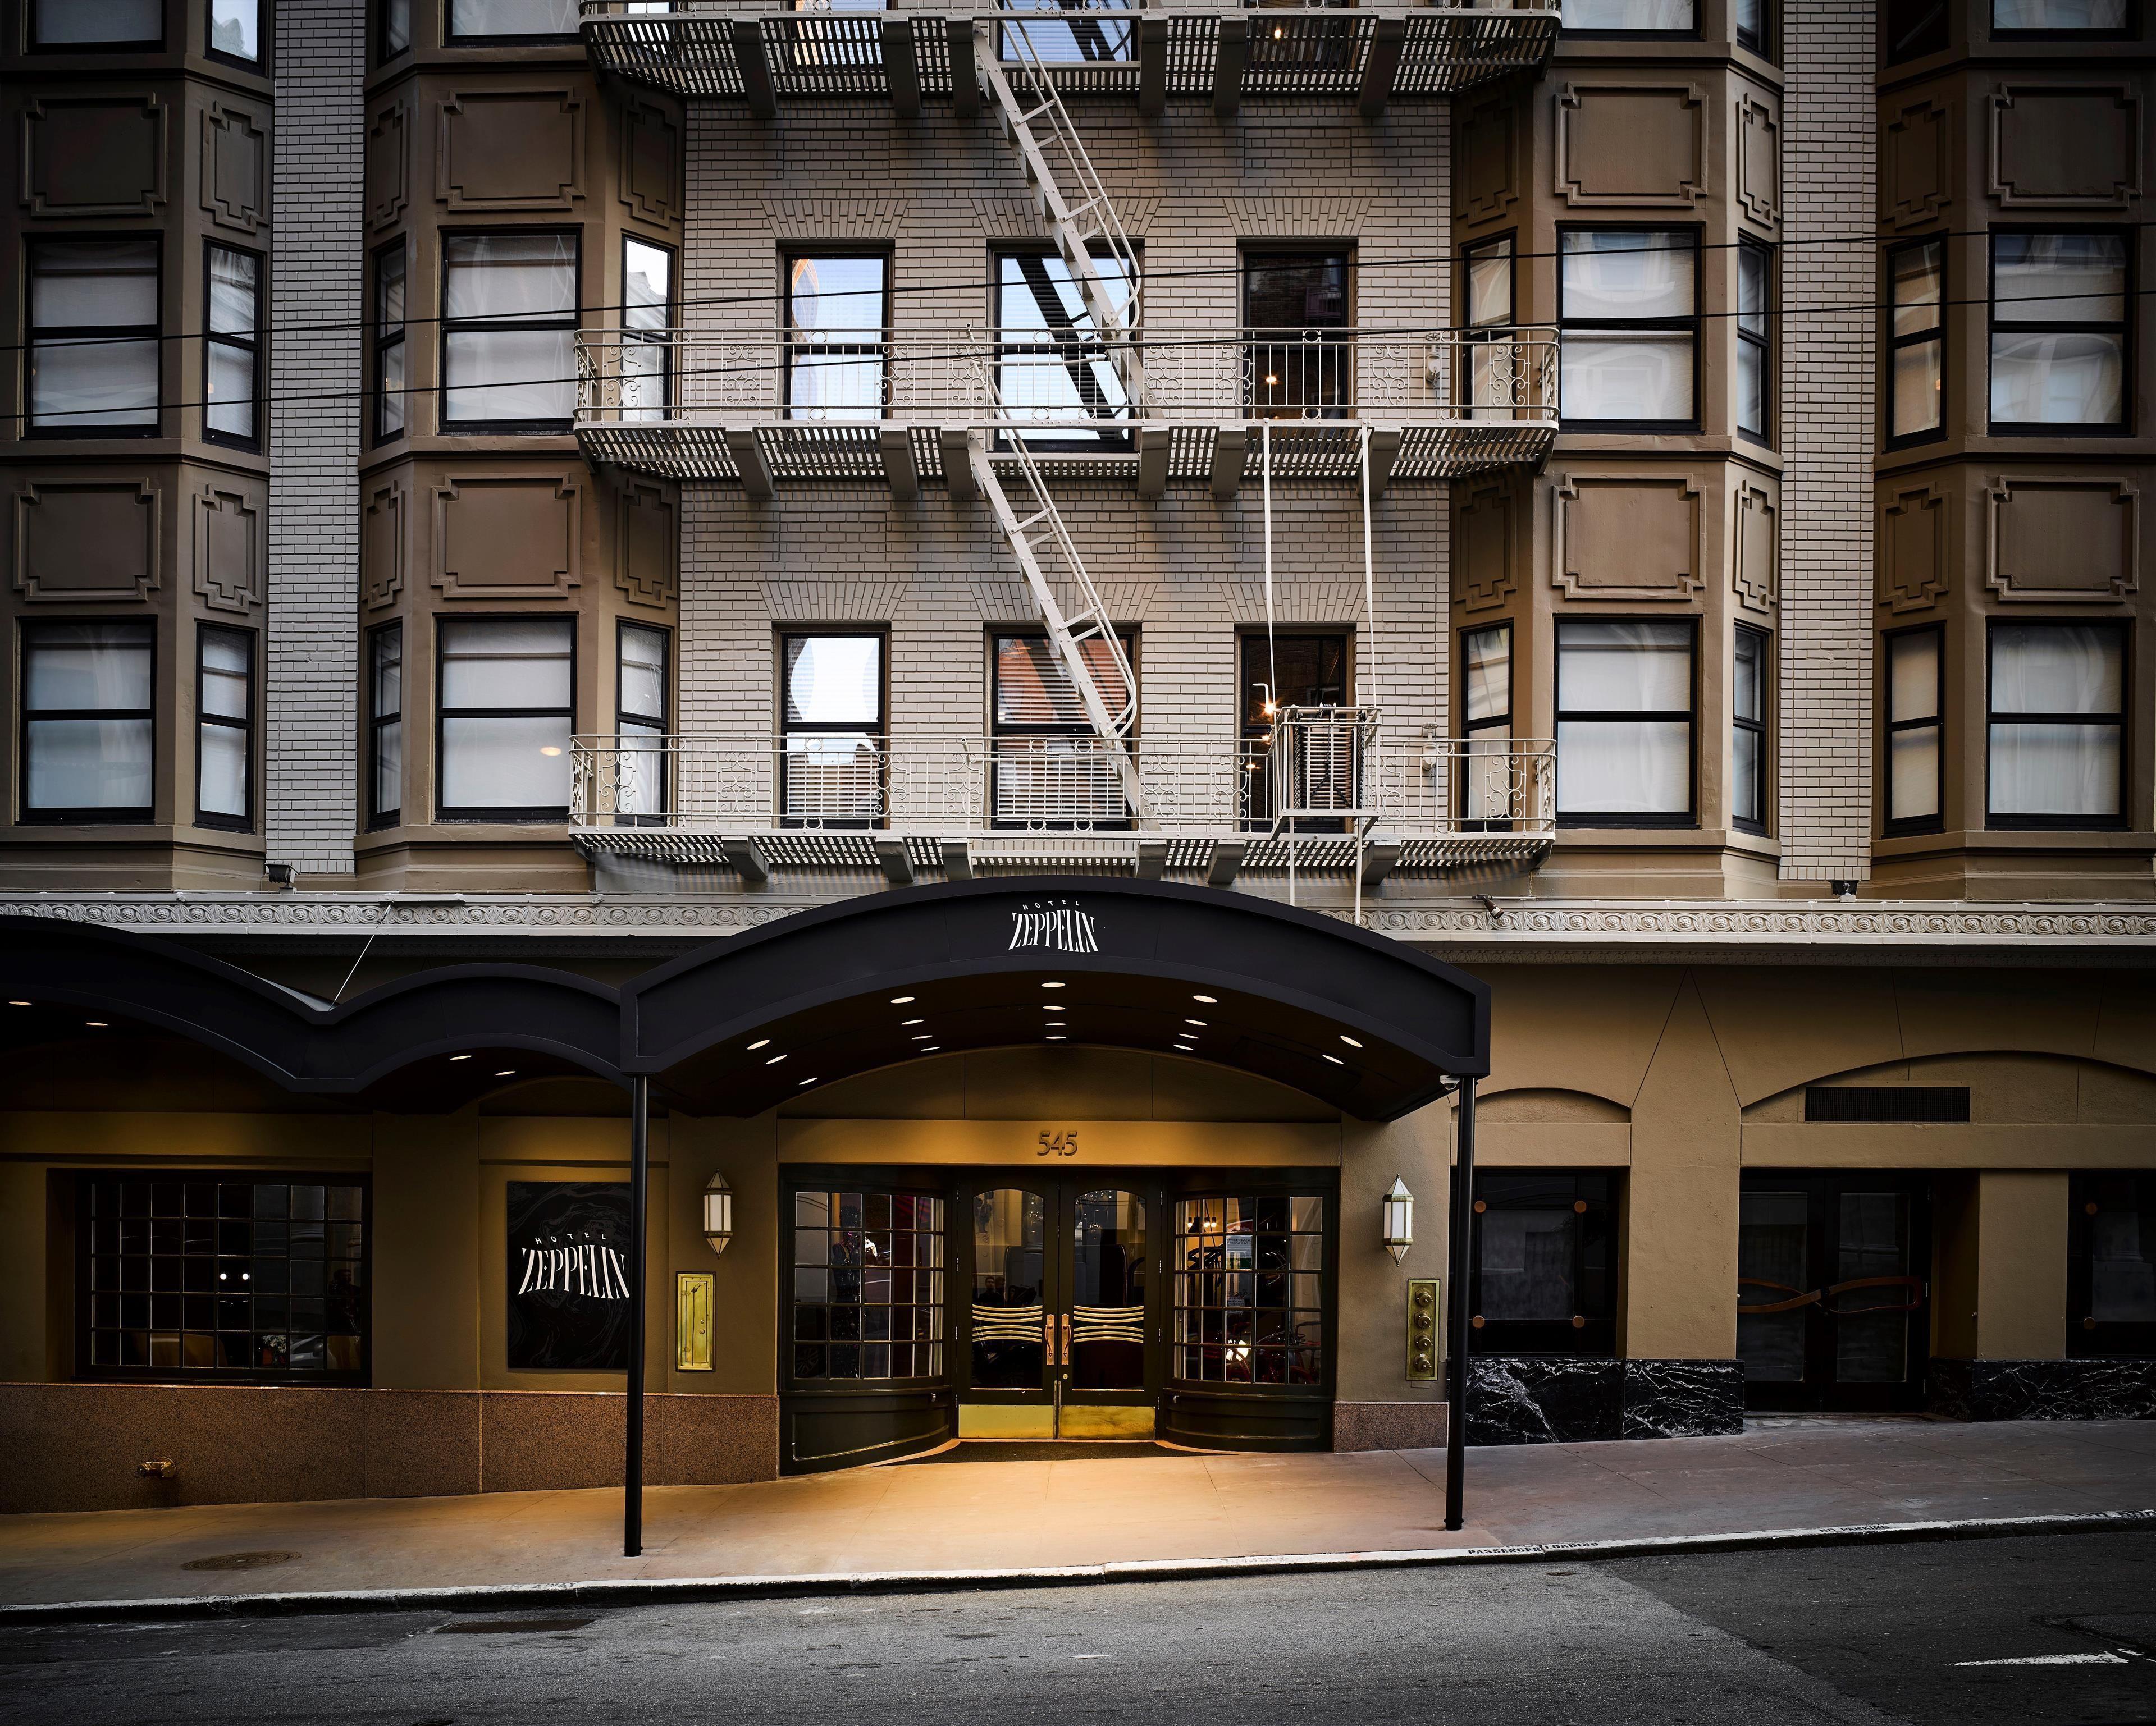 Courtesy of Hotel Zeppelin San Francisco / Expedia.com